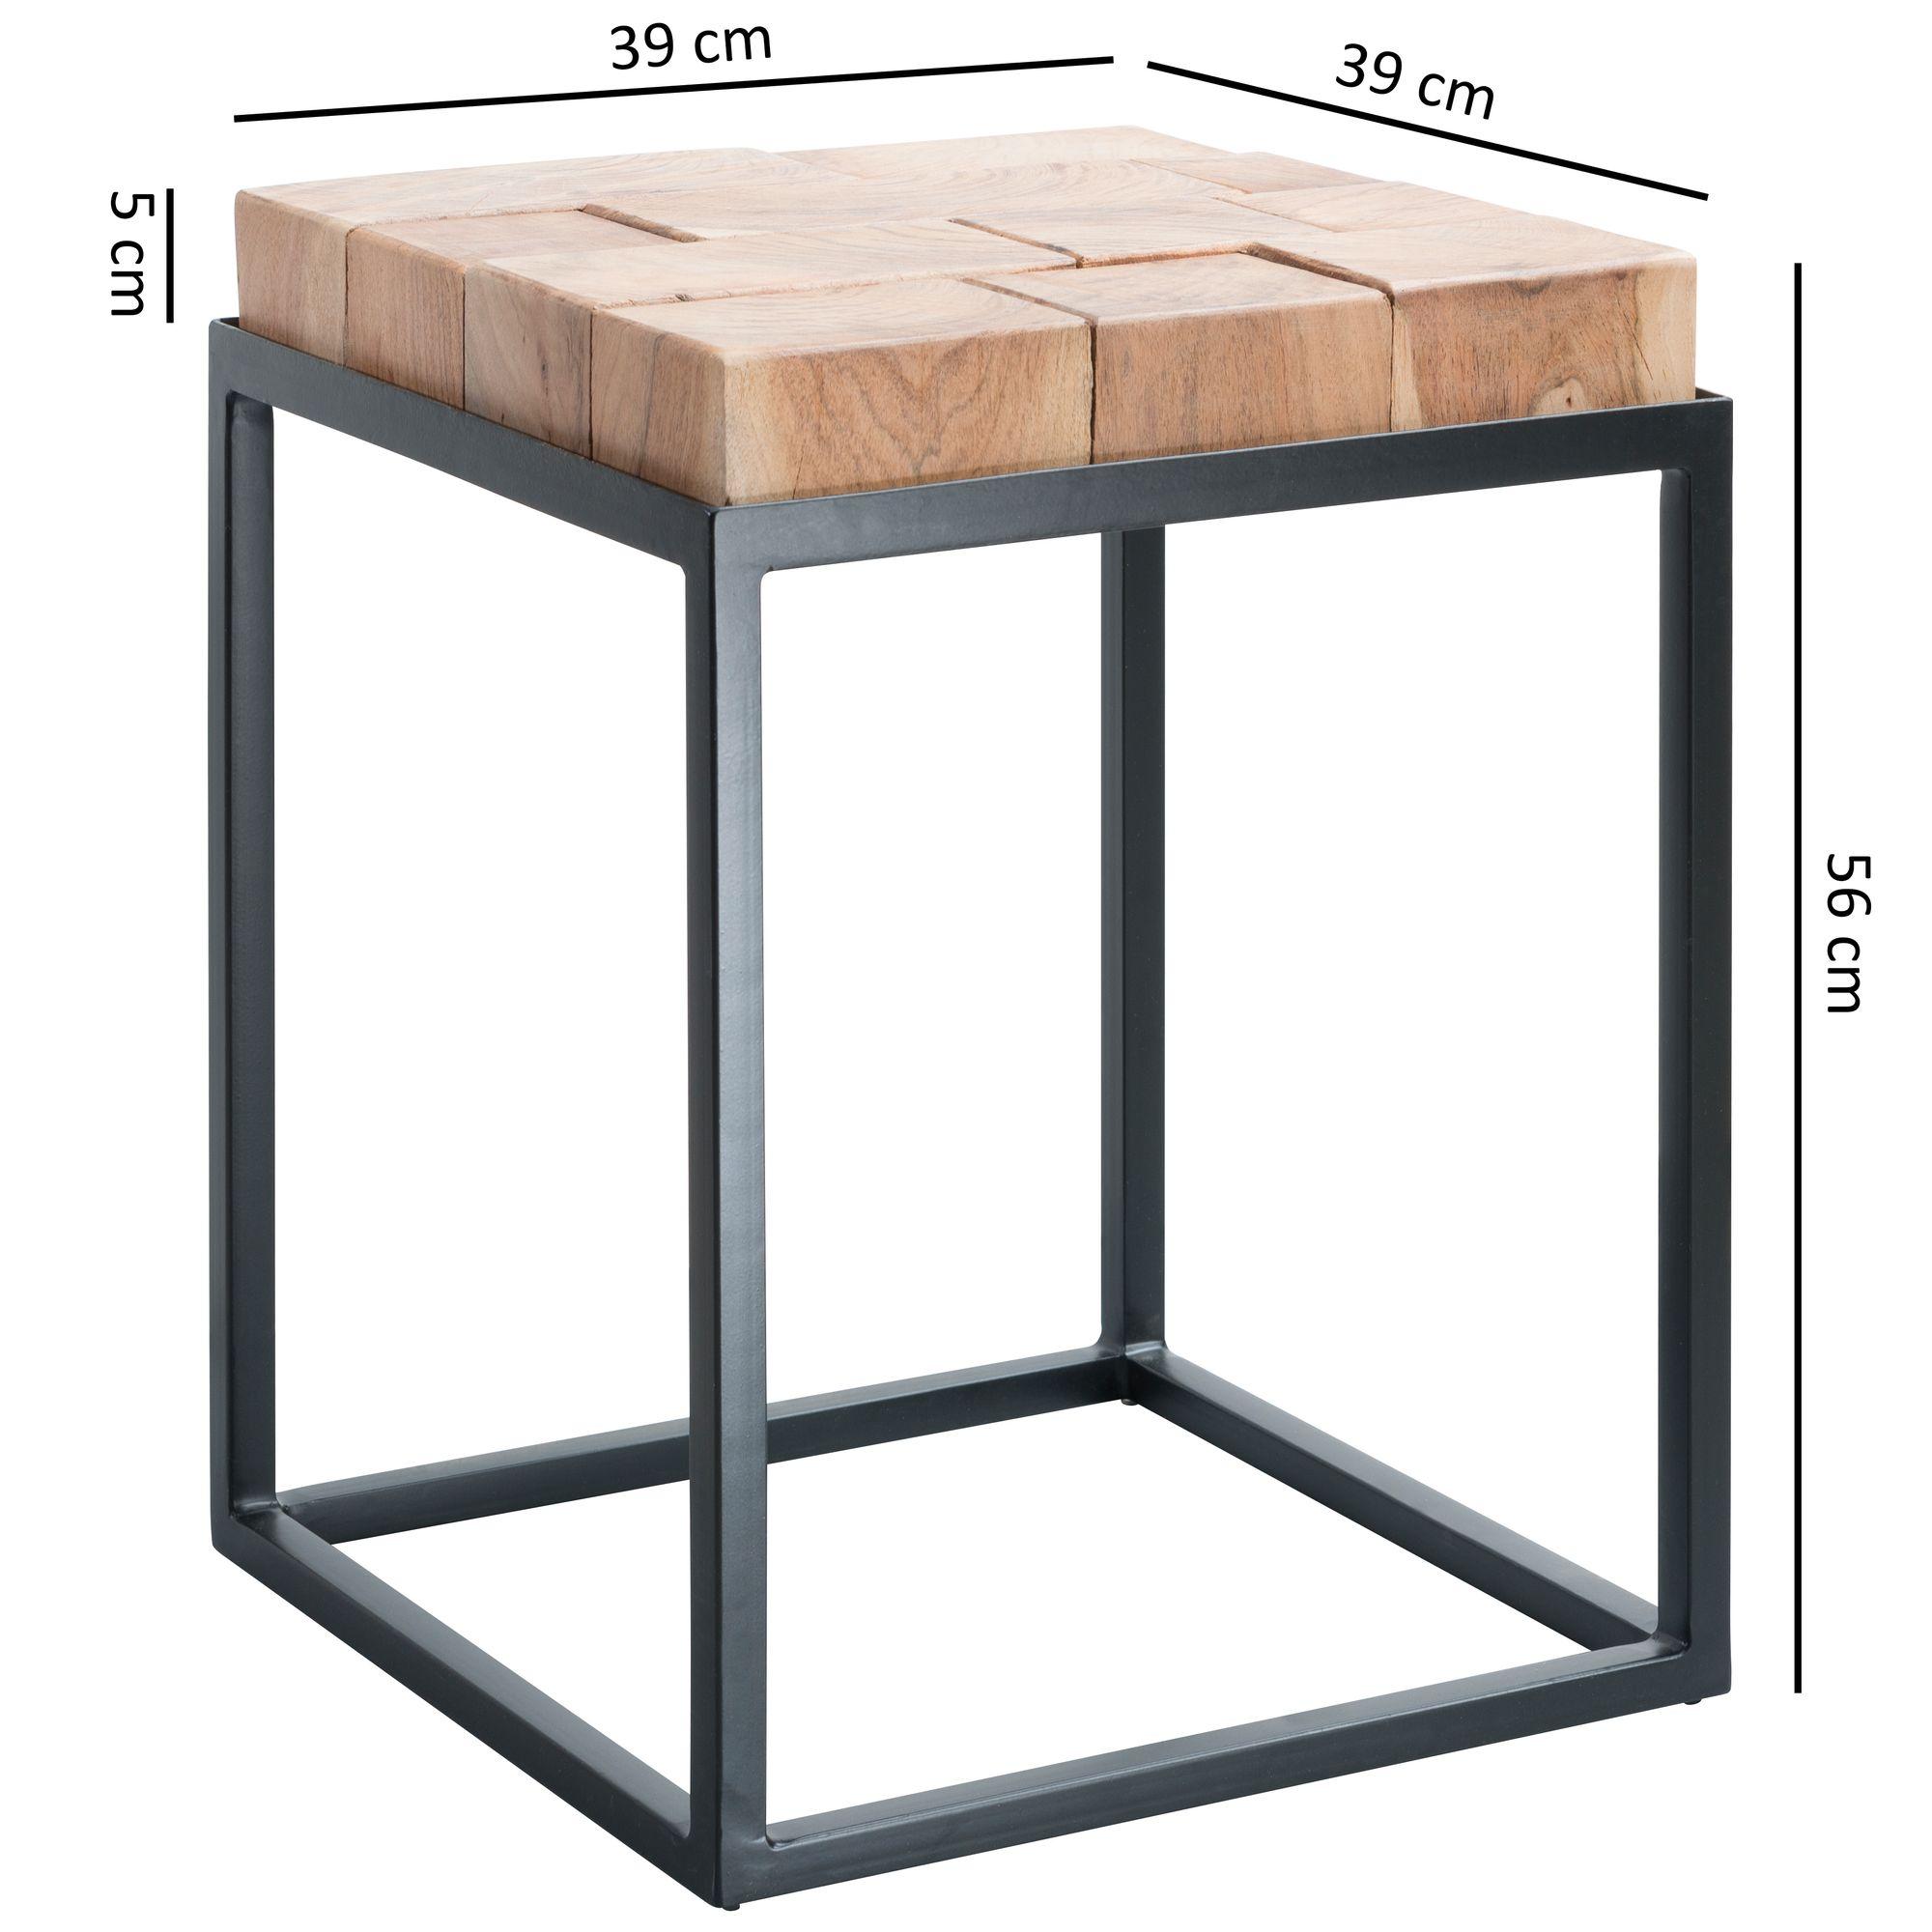 Wohnling Beistelltisch Andur 39x56x39cm Metall Couchtisch Holz